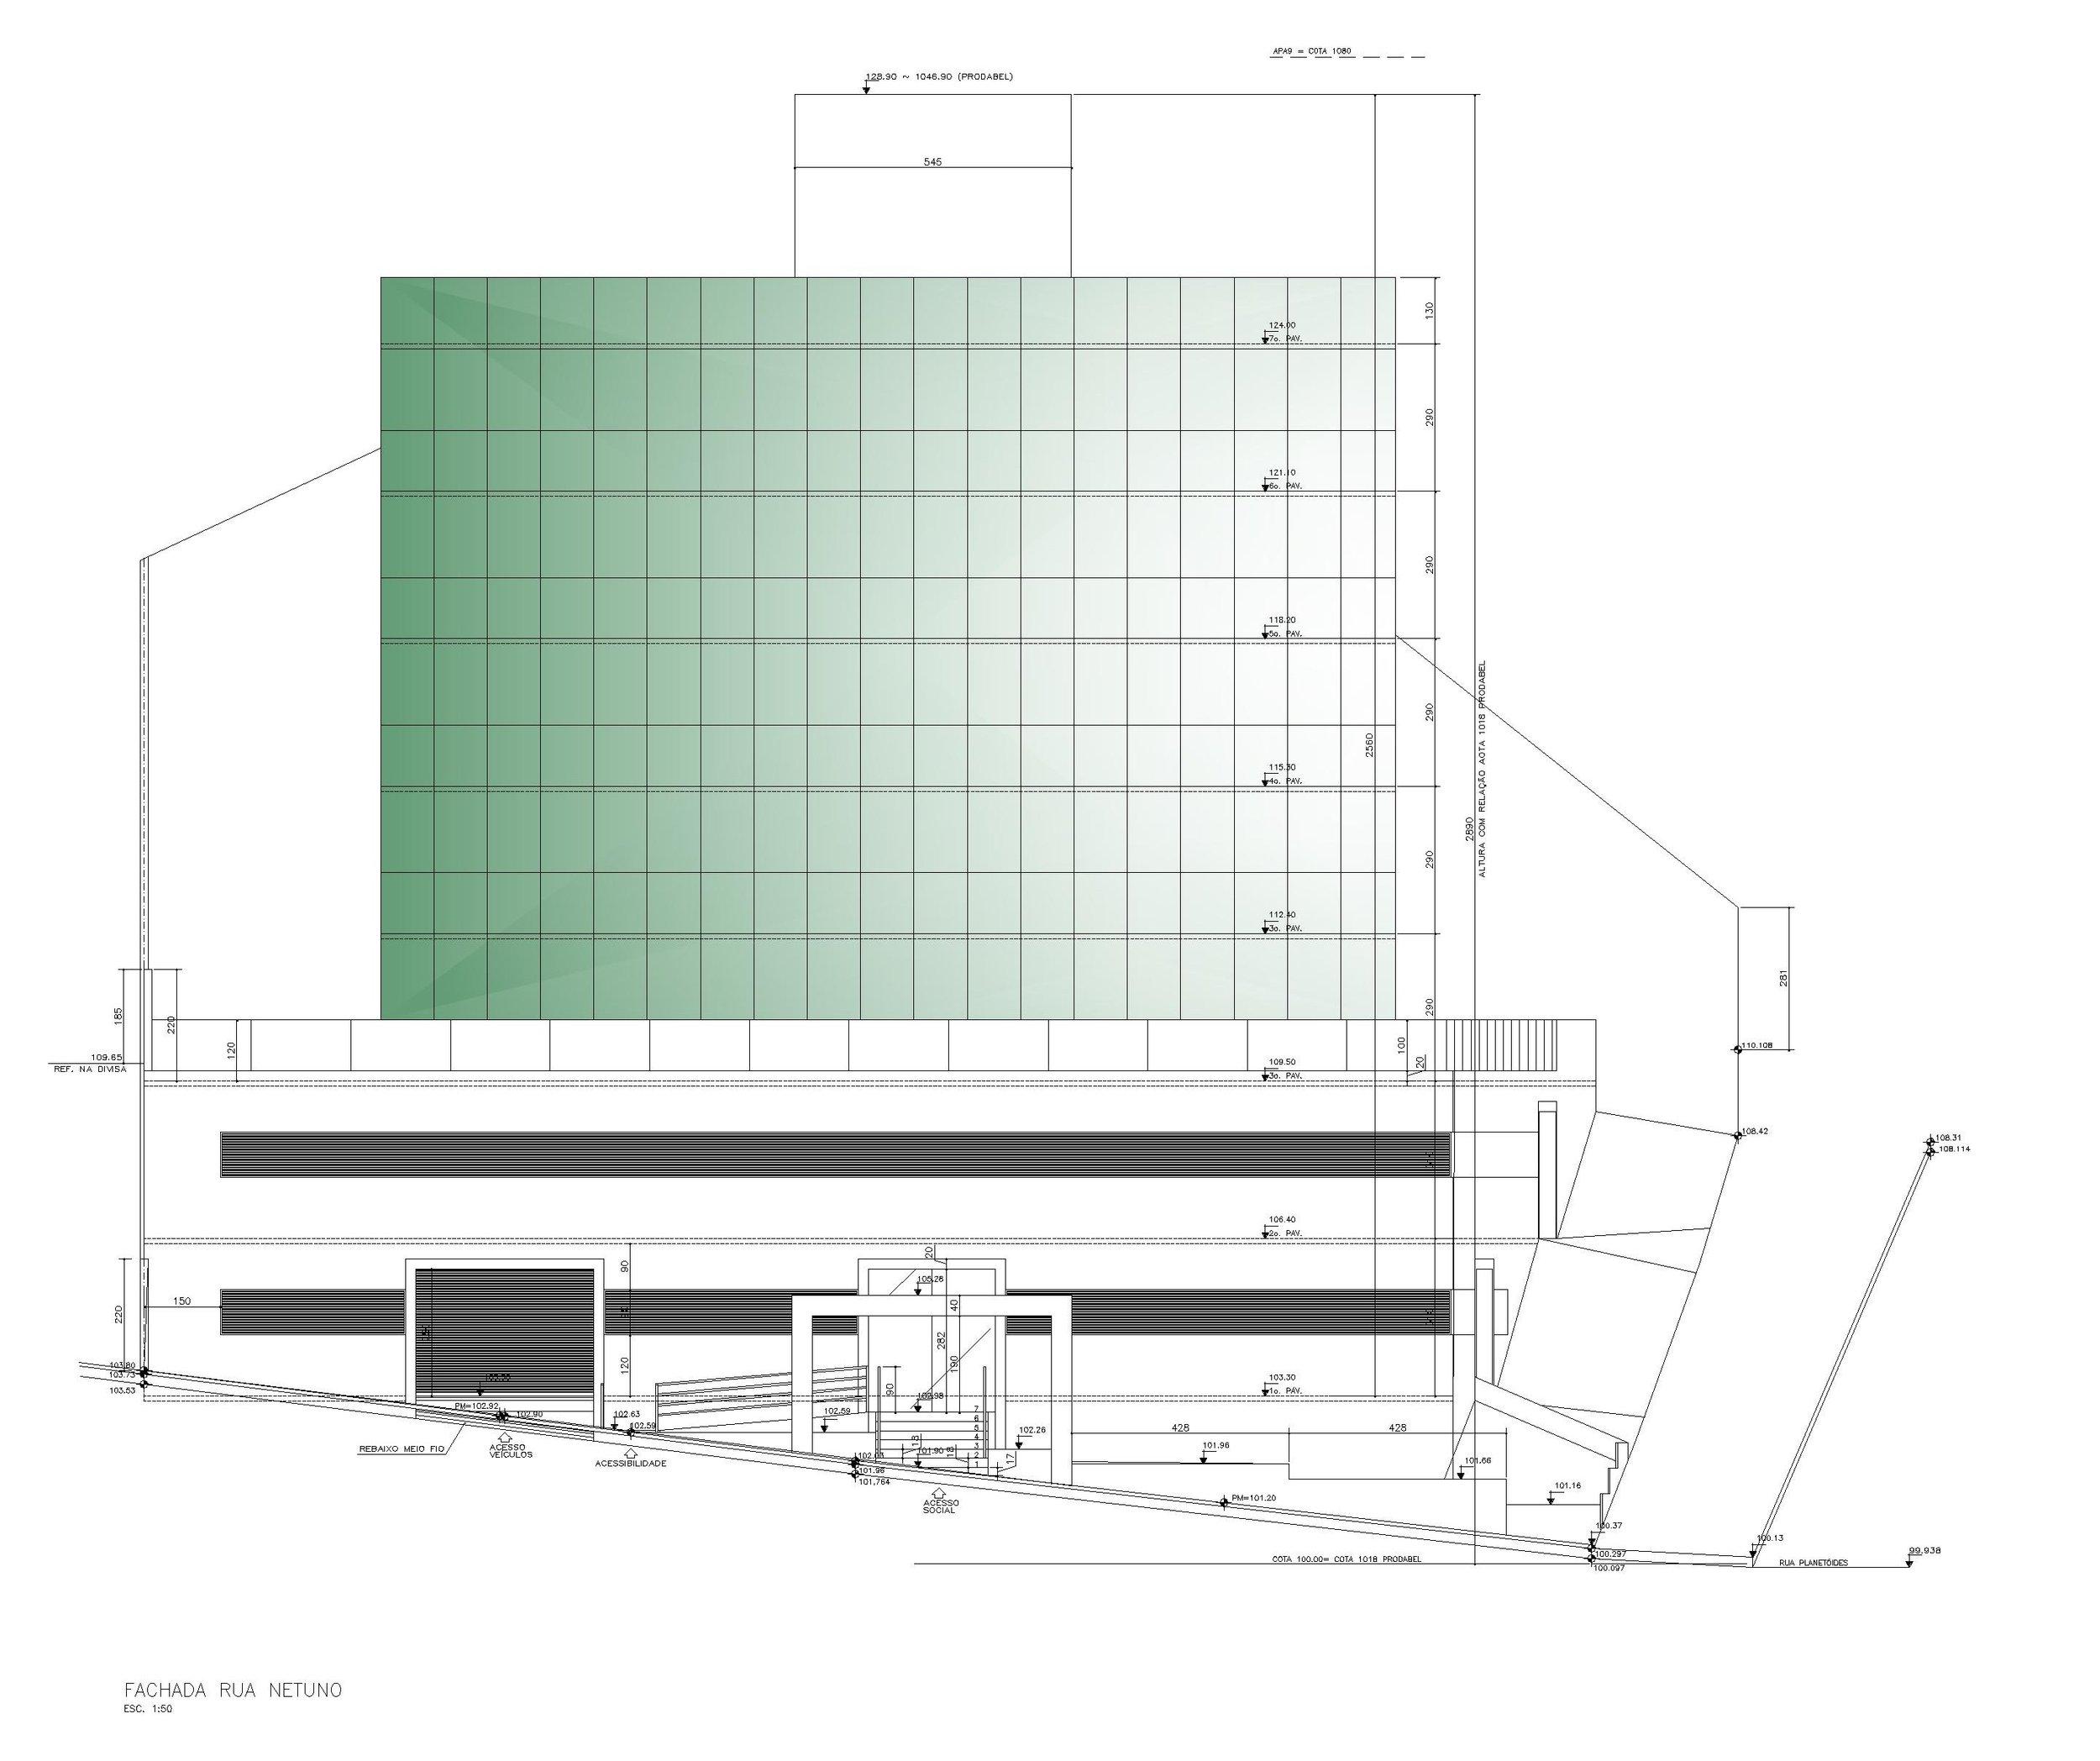 Edifício Comercial Santa Lúcia - Belo Horizonte/MG  Cliente: Construtora APO